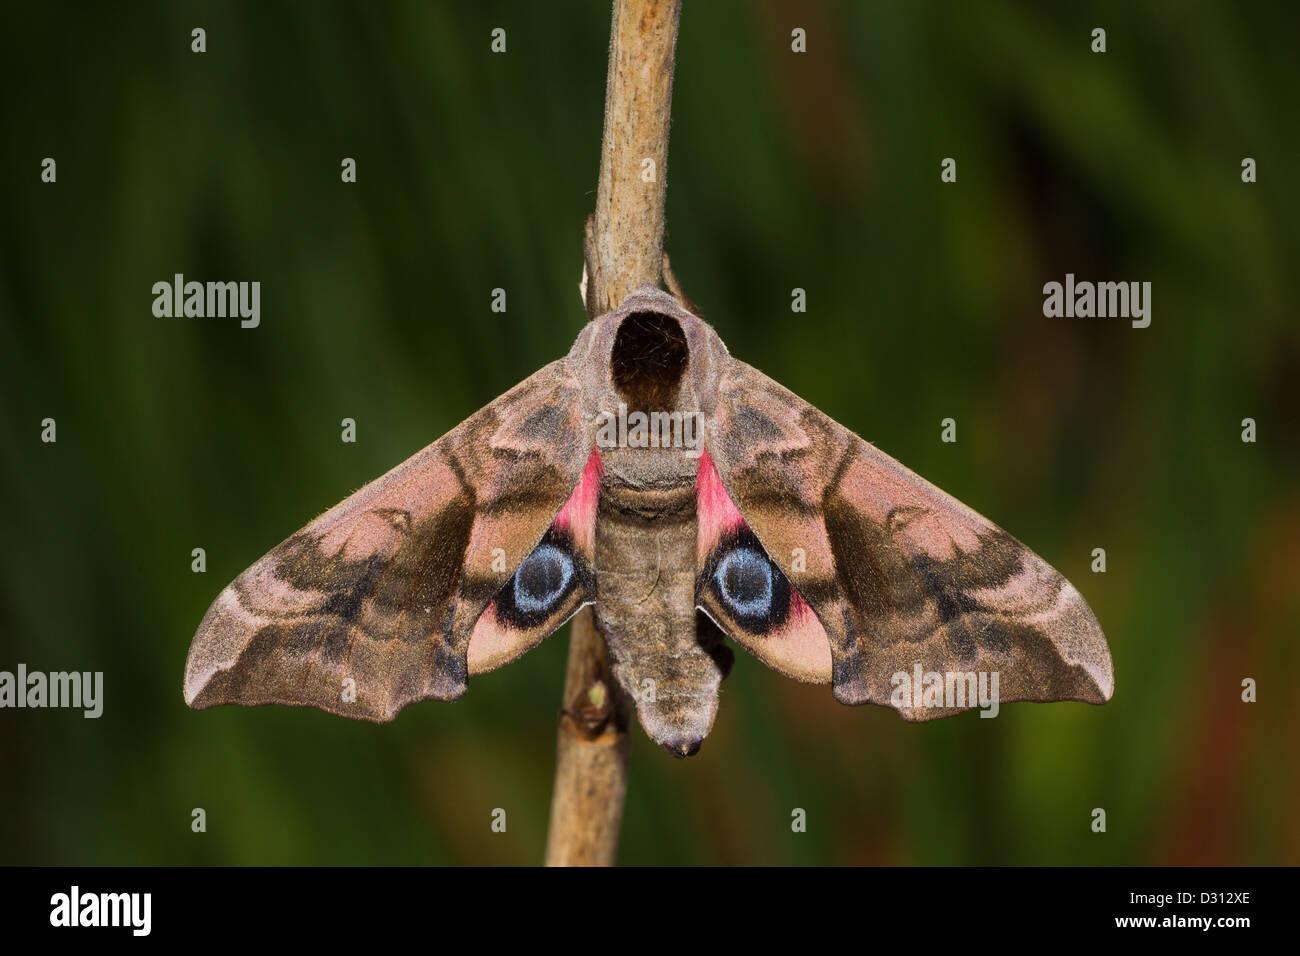 Abendpfauenauge Eyed Hawk-Moth Stockbild